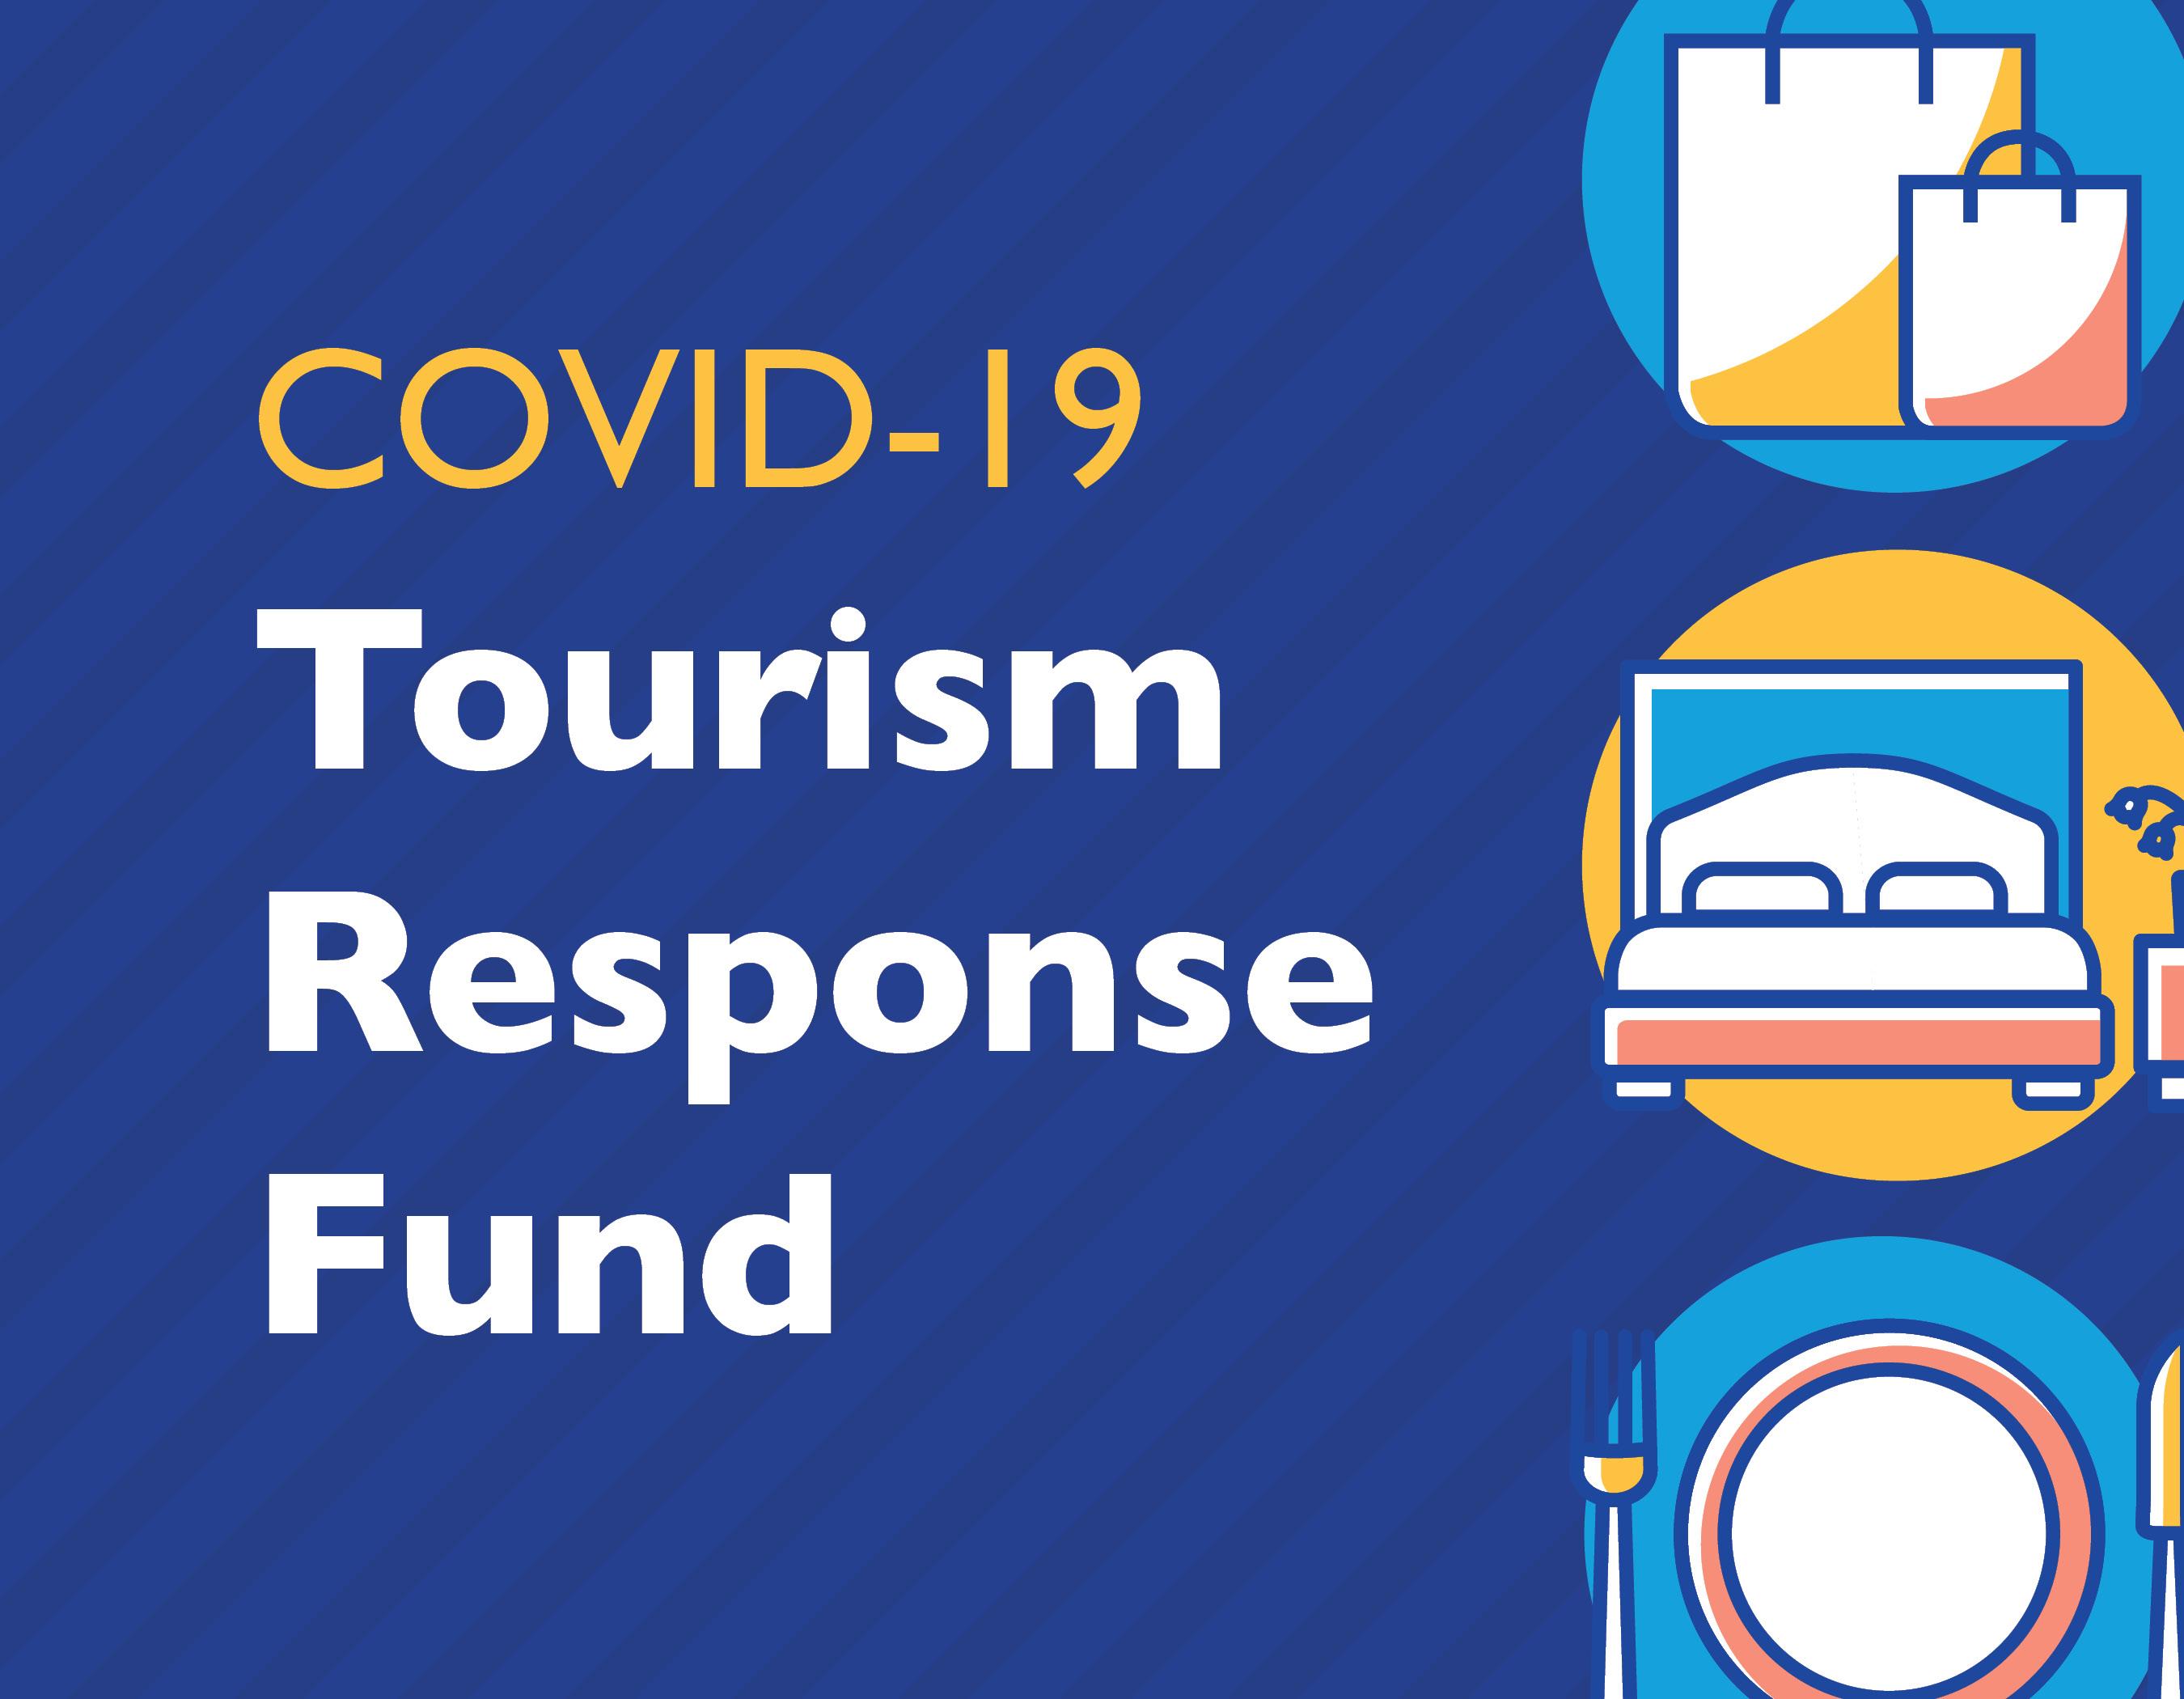 COVID Tourism Response Fund Post3